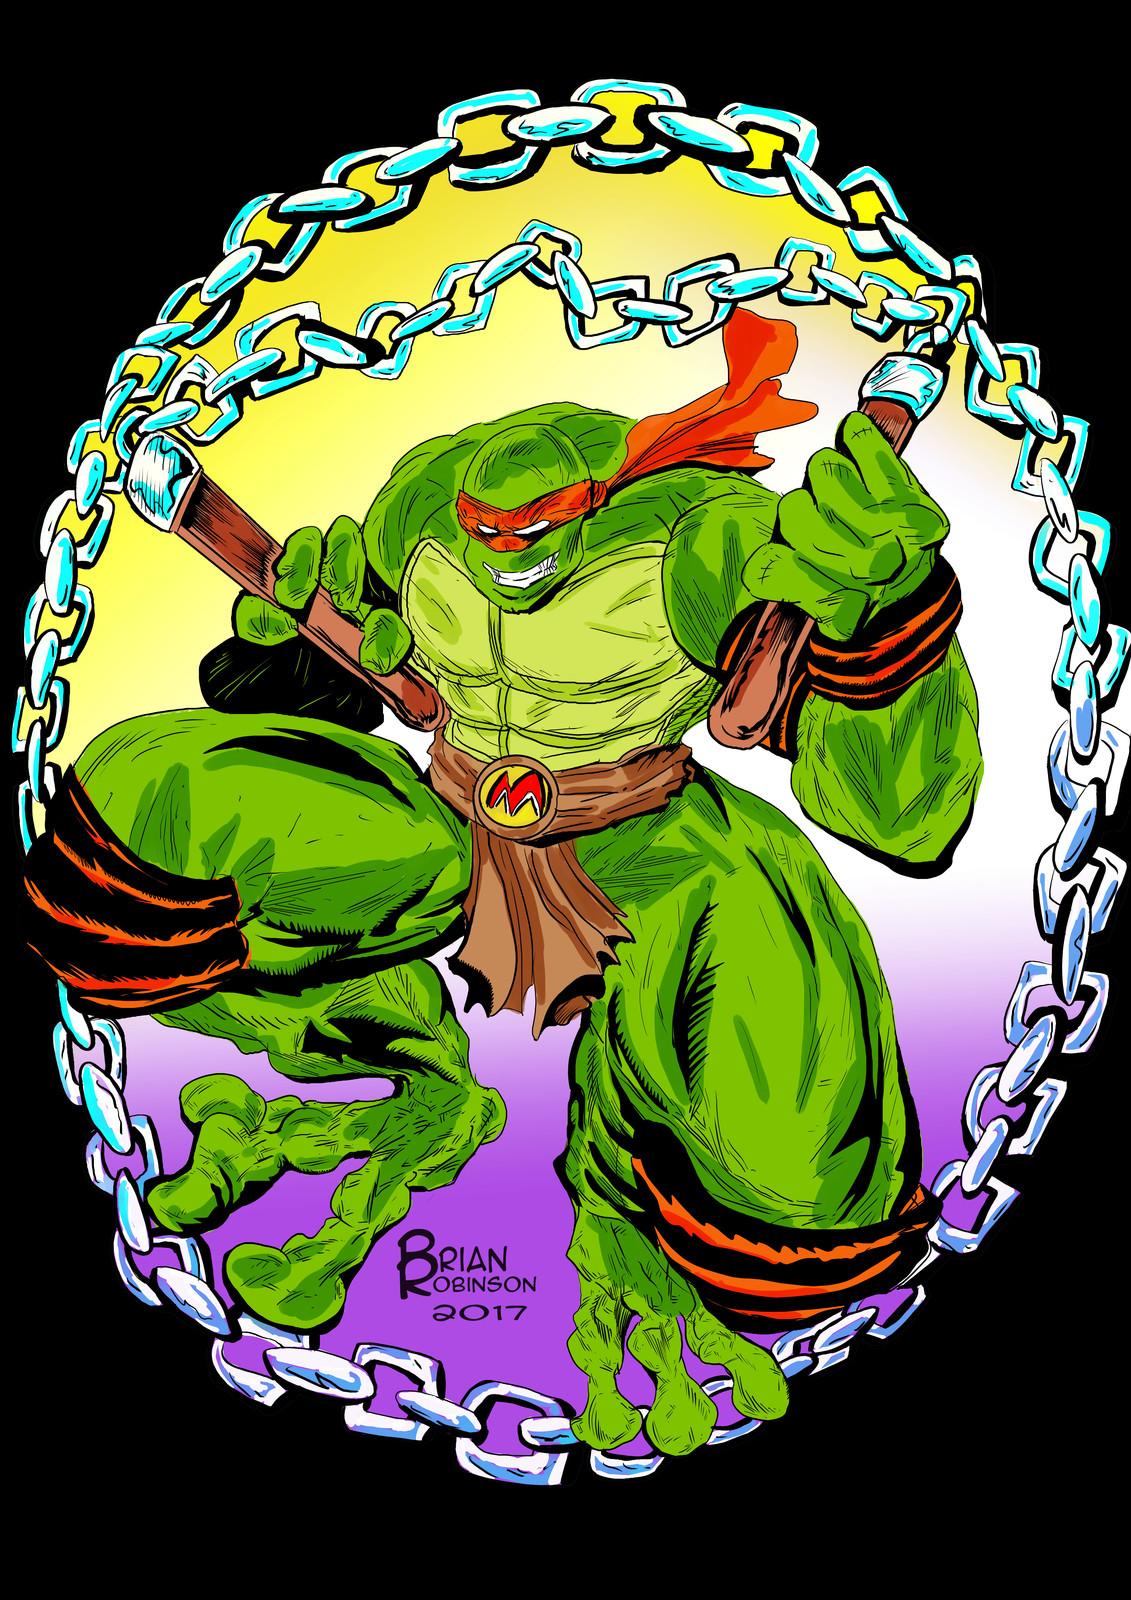 Teenage Mutant Ninja Turtles:Michelangelo drawing color by Brian Robinson